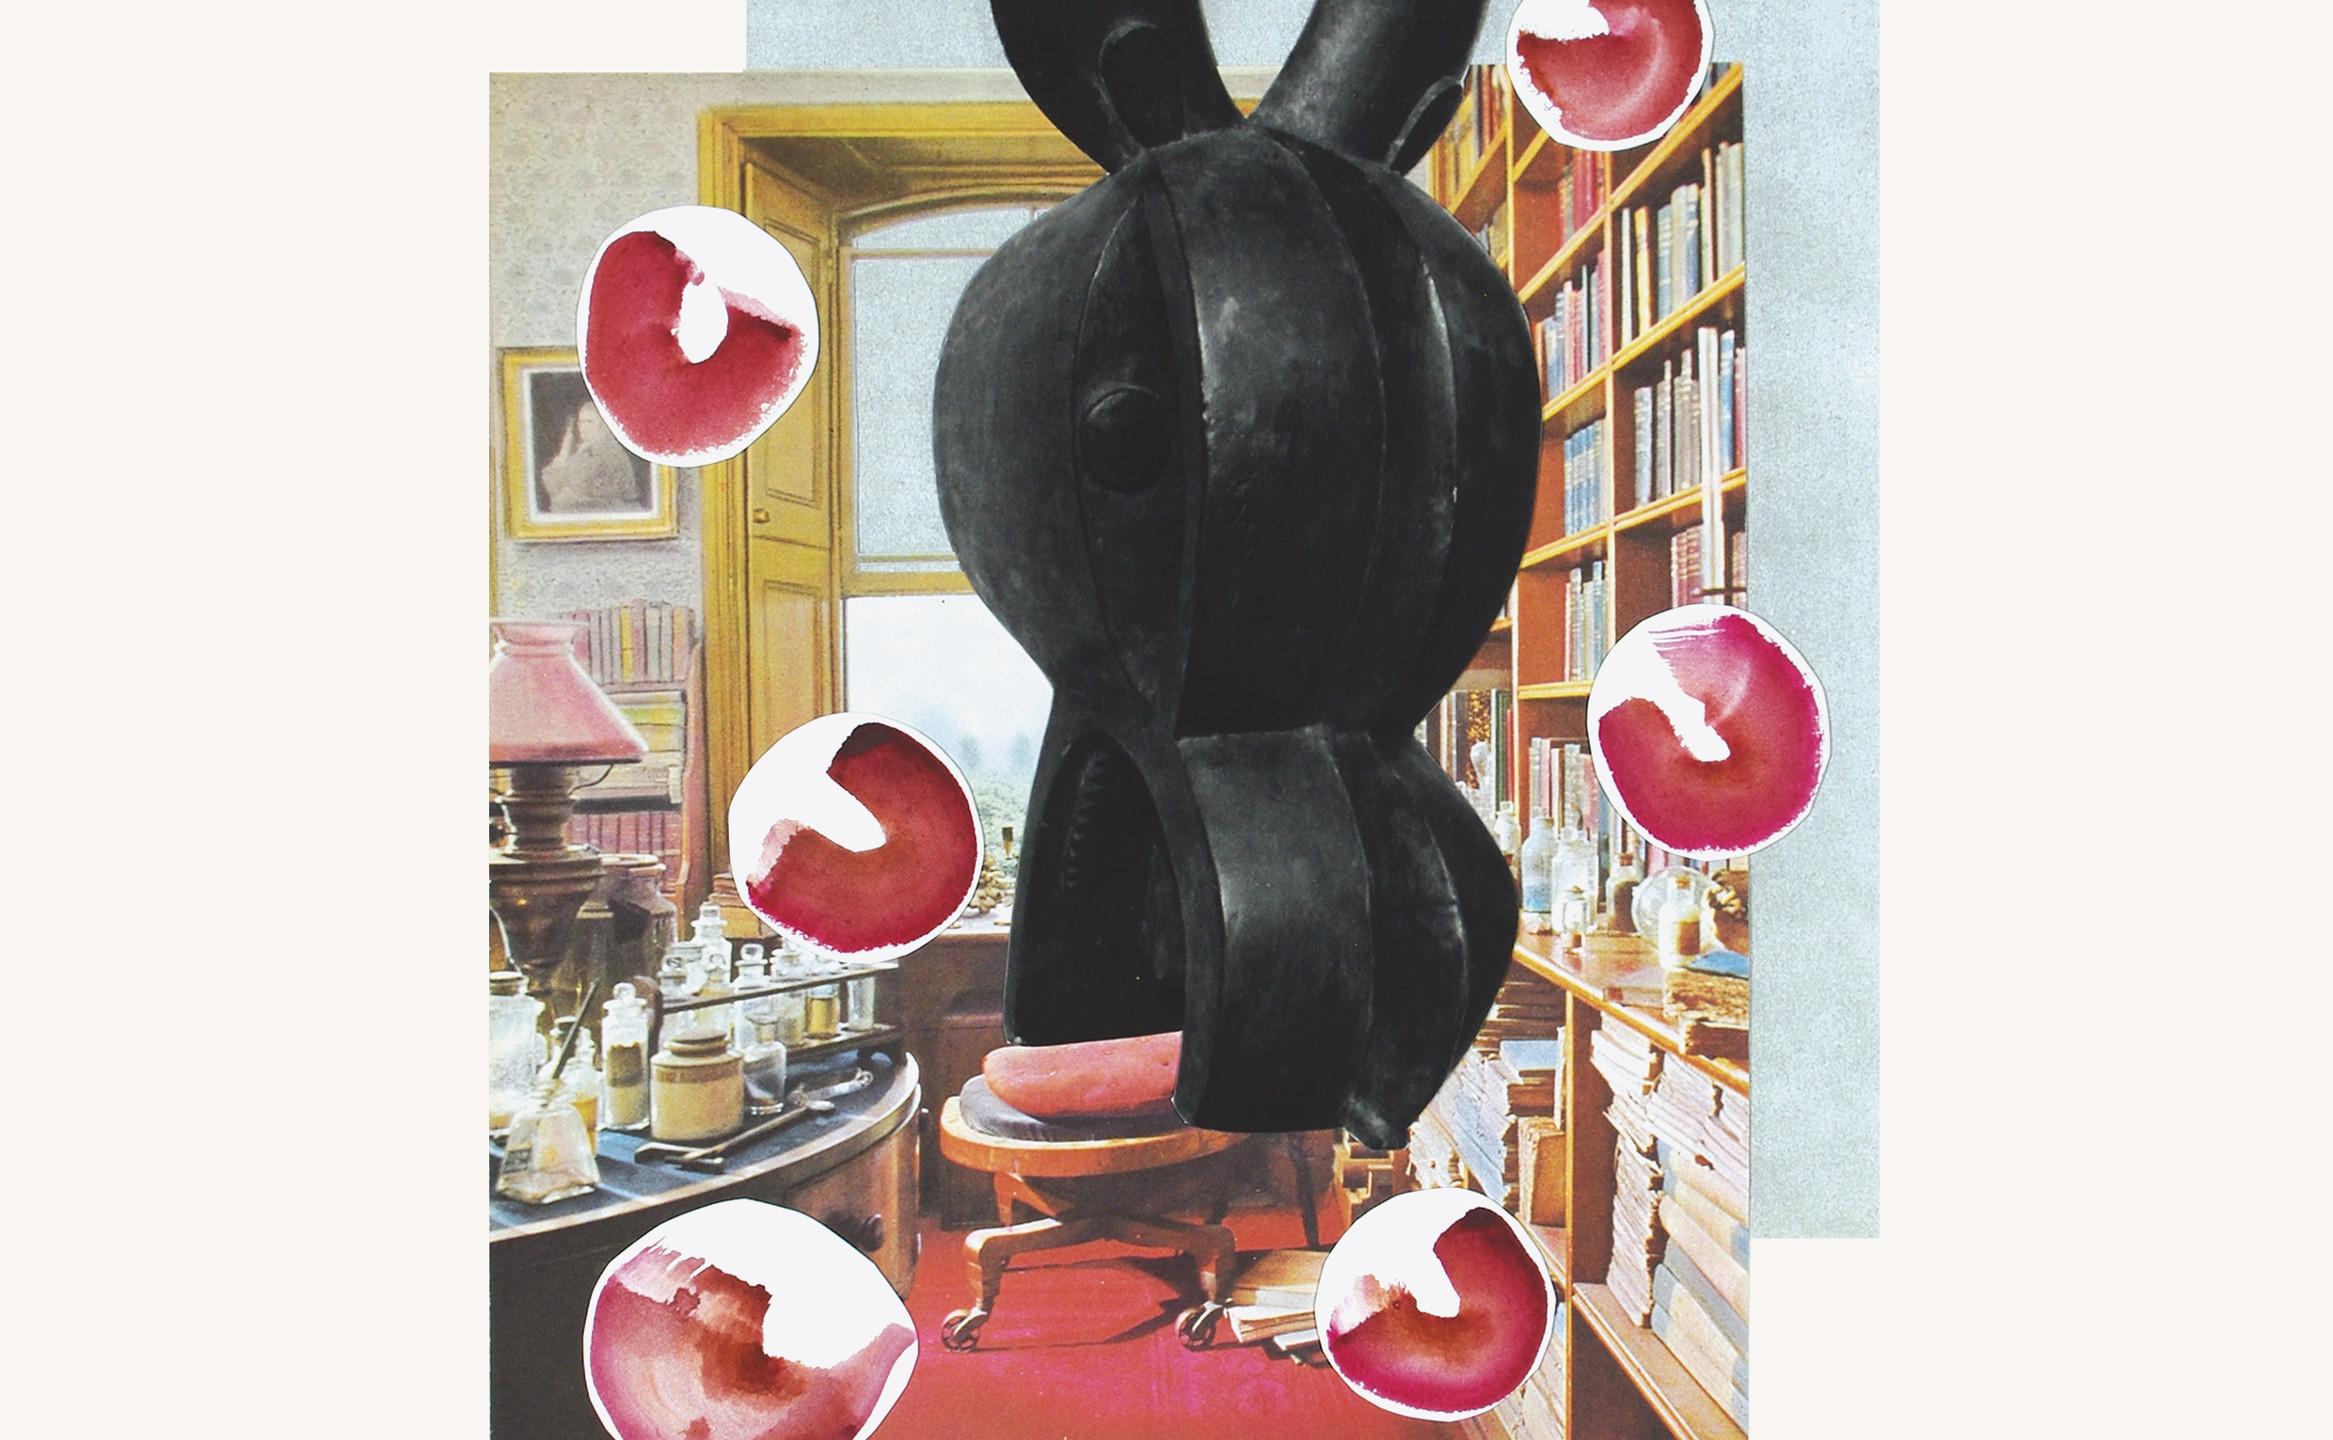 Darwins Room, Larita Engelbrecht, Mixed Media Collage on Paper, 48 x 37cm (2333x3000)